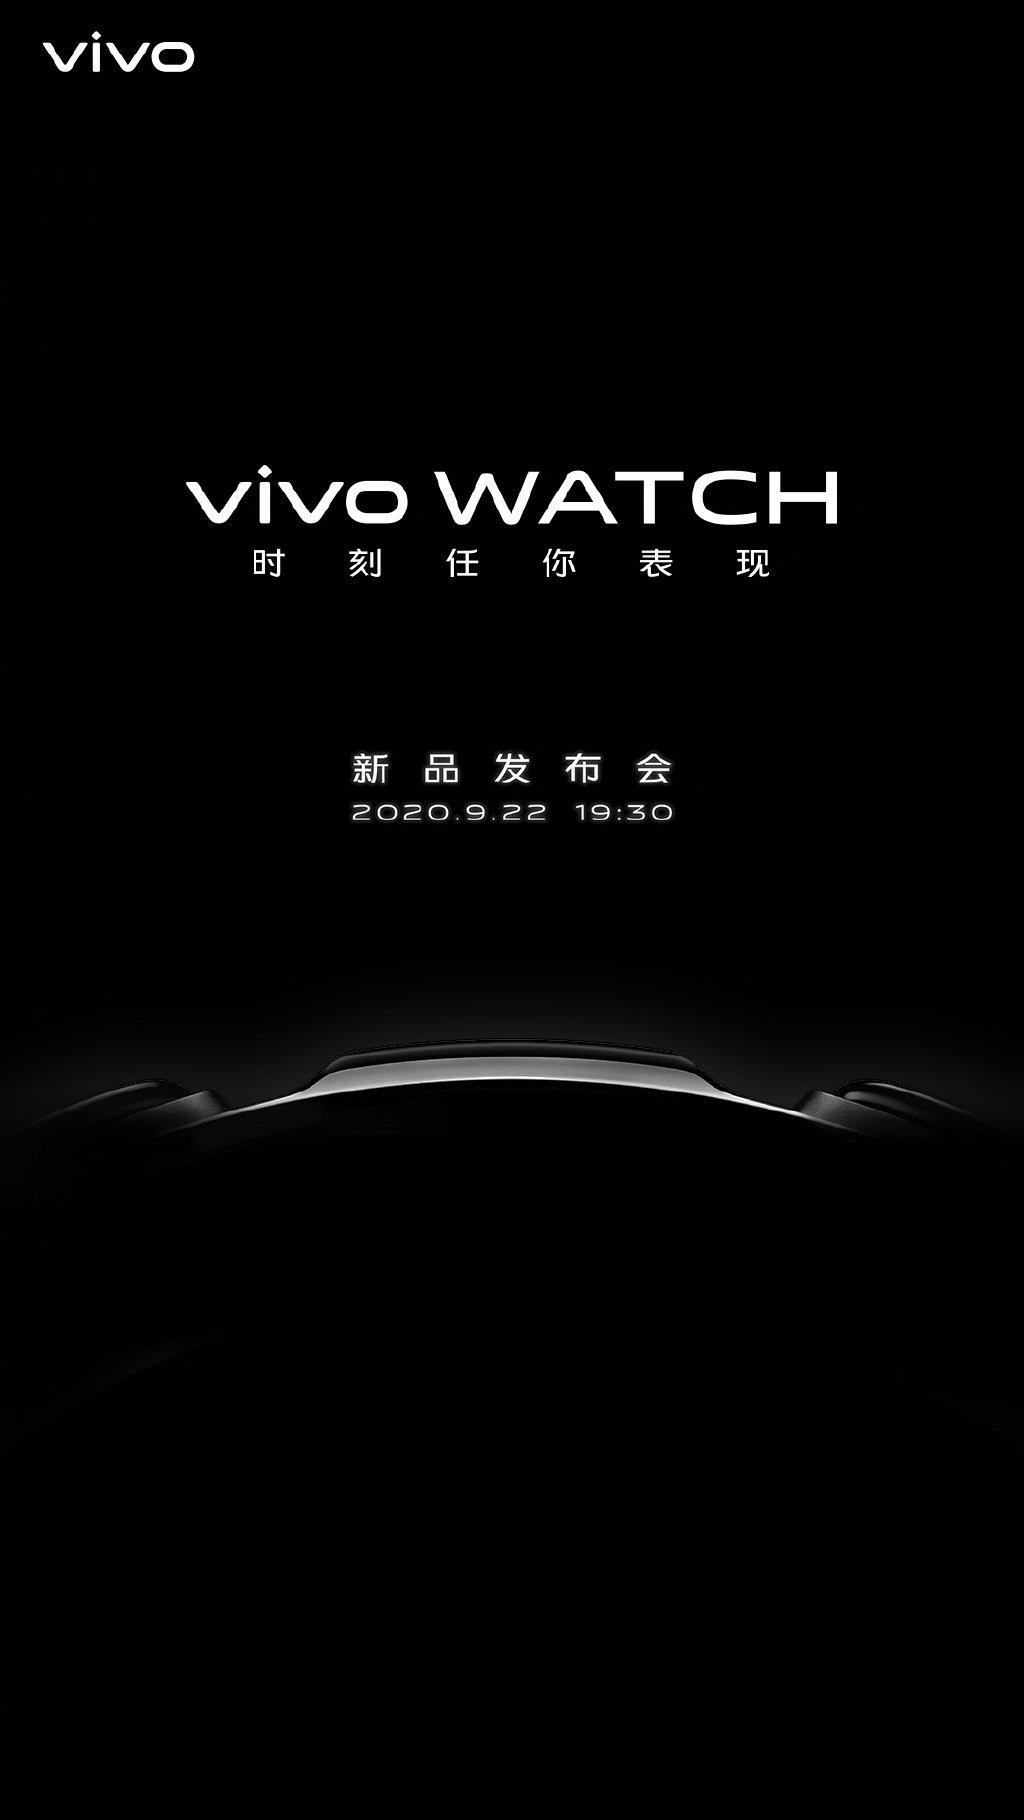 vivo Watch 外观设计公布:圆形表盘,两种设计 - 热点资讯 每日推荐 第3张